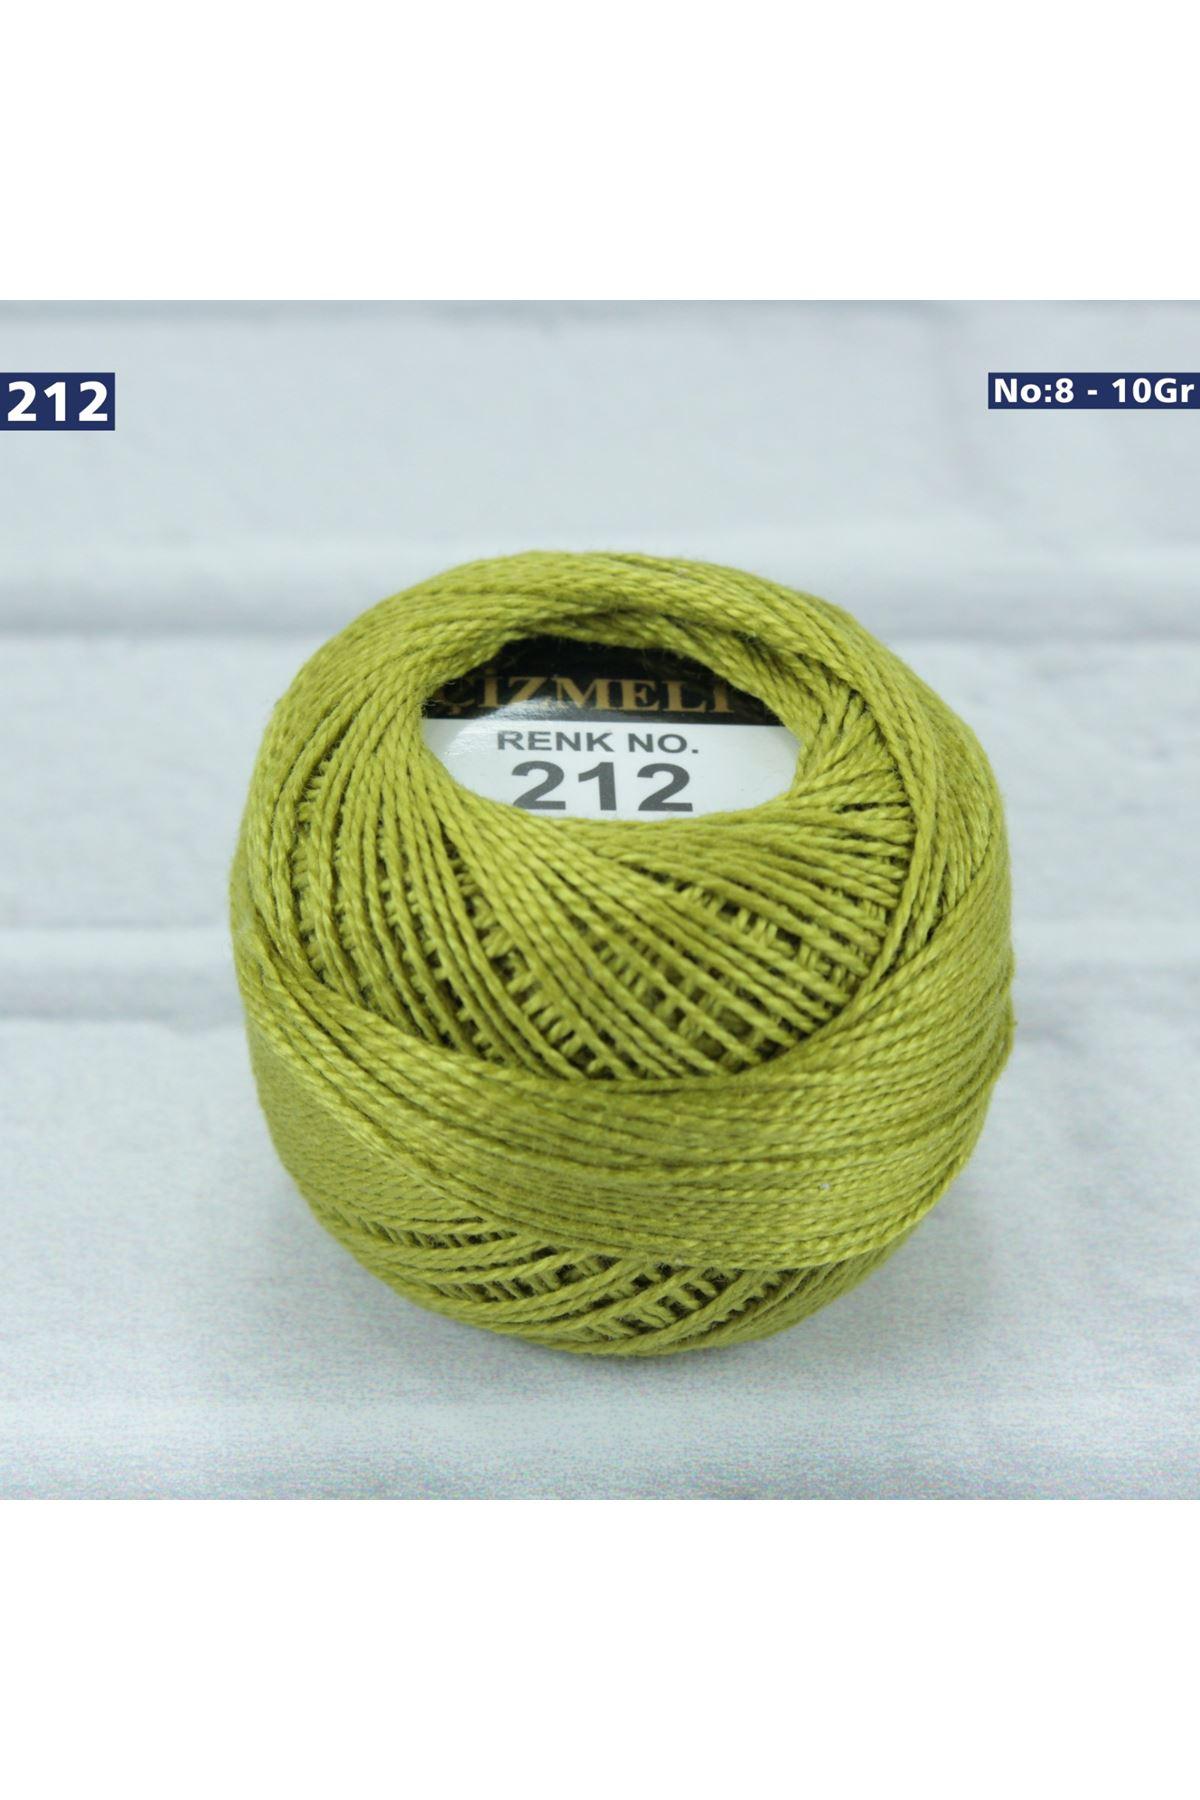 Çizmeli Cotton Perle Nakış İpliği No: 212